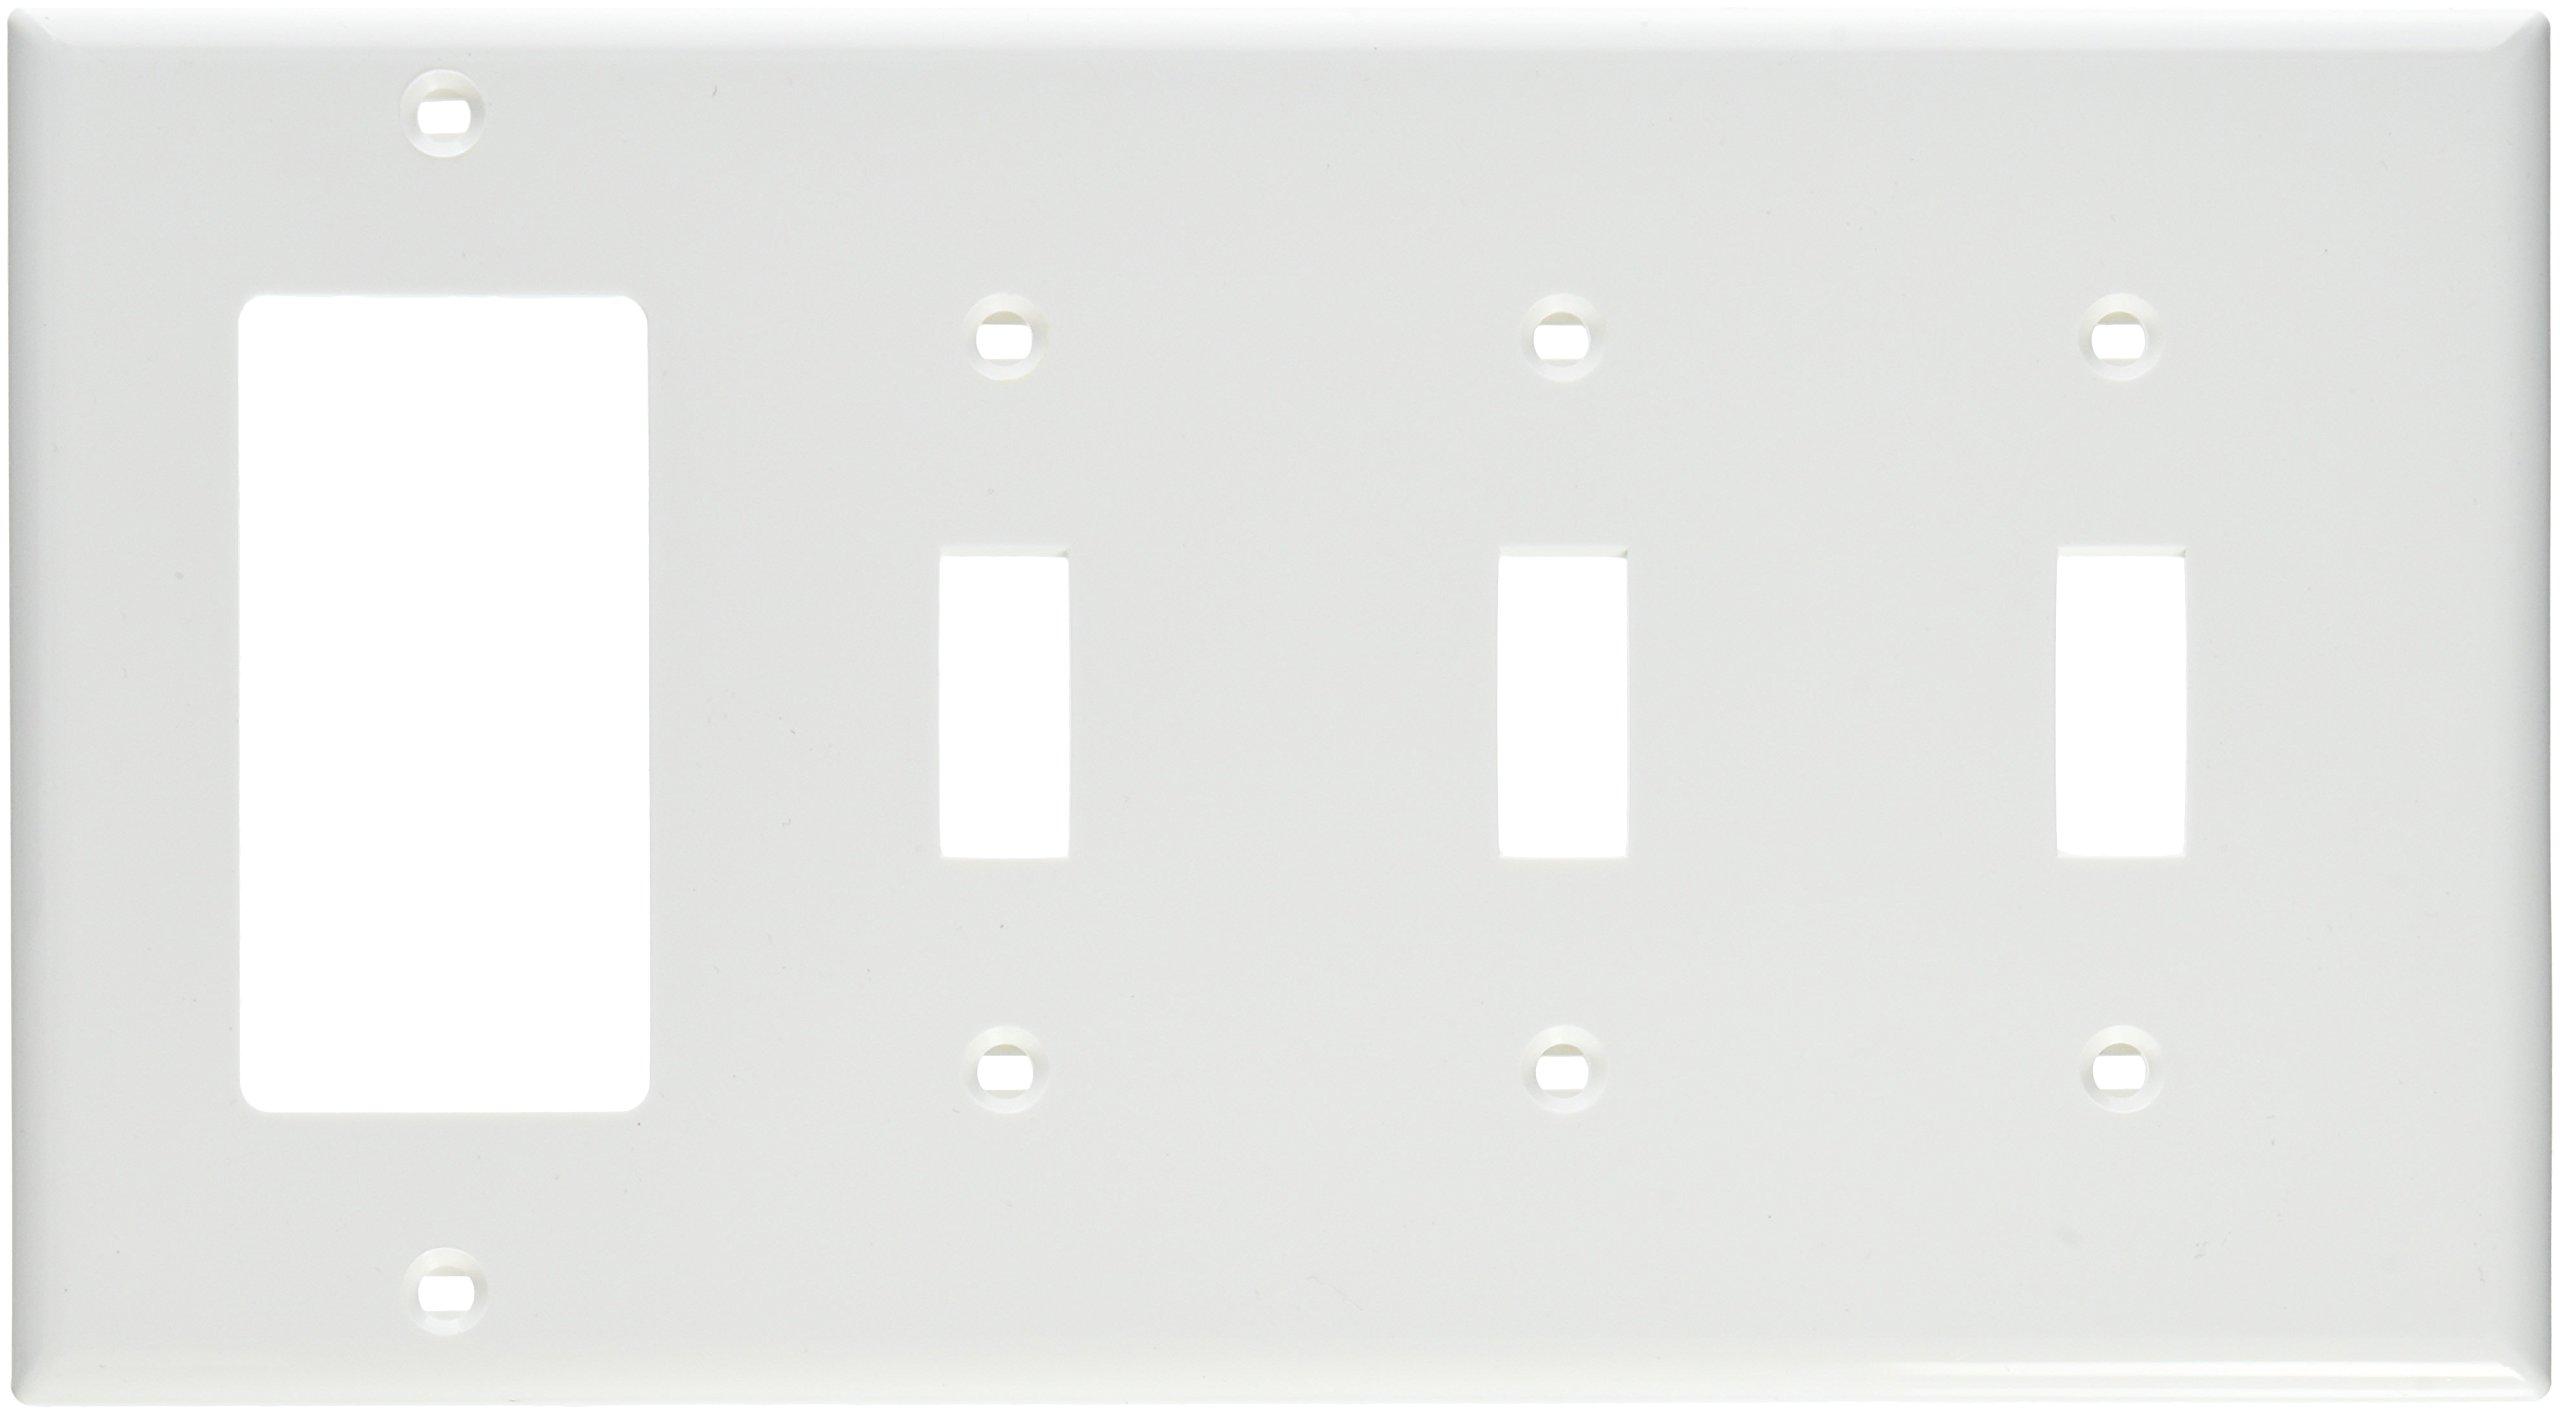 Leviton 80732-W 4-Gang 3-Toggle 1-Decora/GFCI Device Combination Wallplate, Standard Size, Thermoplastic Nylon, Device Mount, White